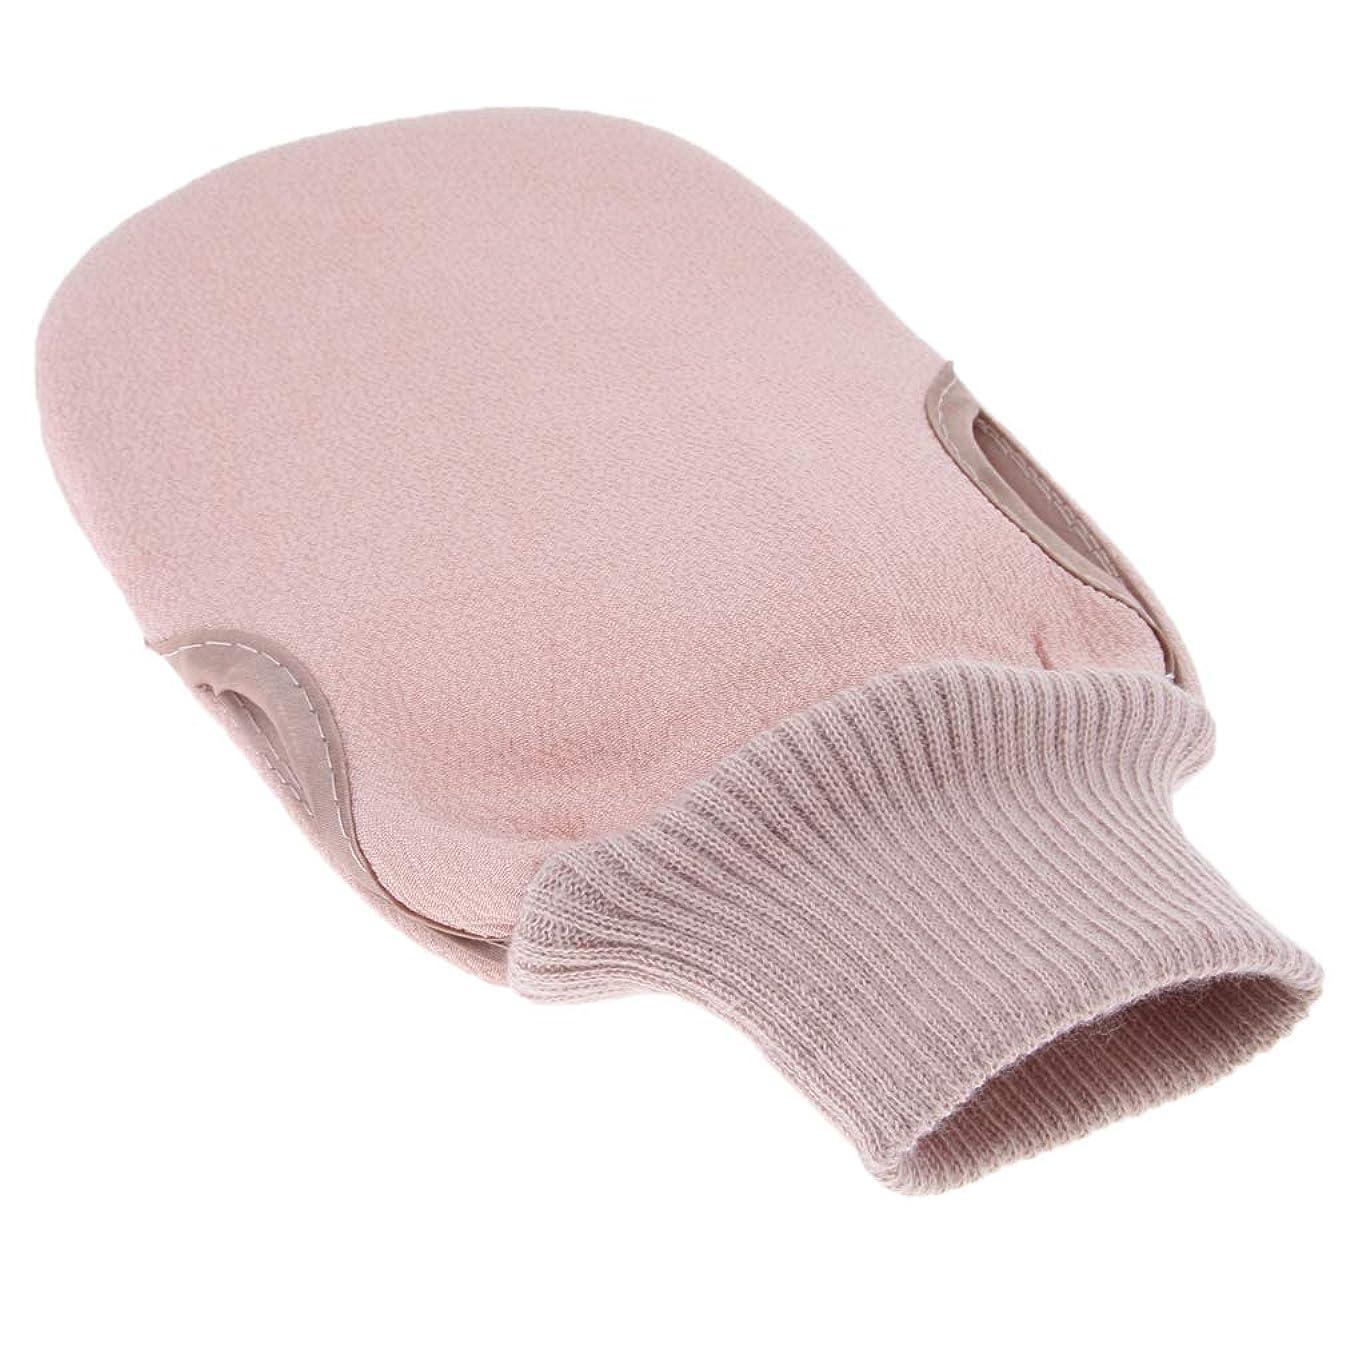 chiwanji 丈夫な女性の男性のバスローブシャワーシャワースクラバーミットディープクリーン - ピンク